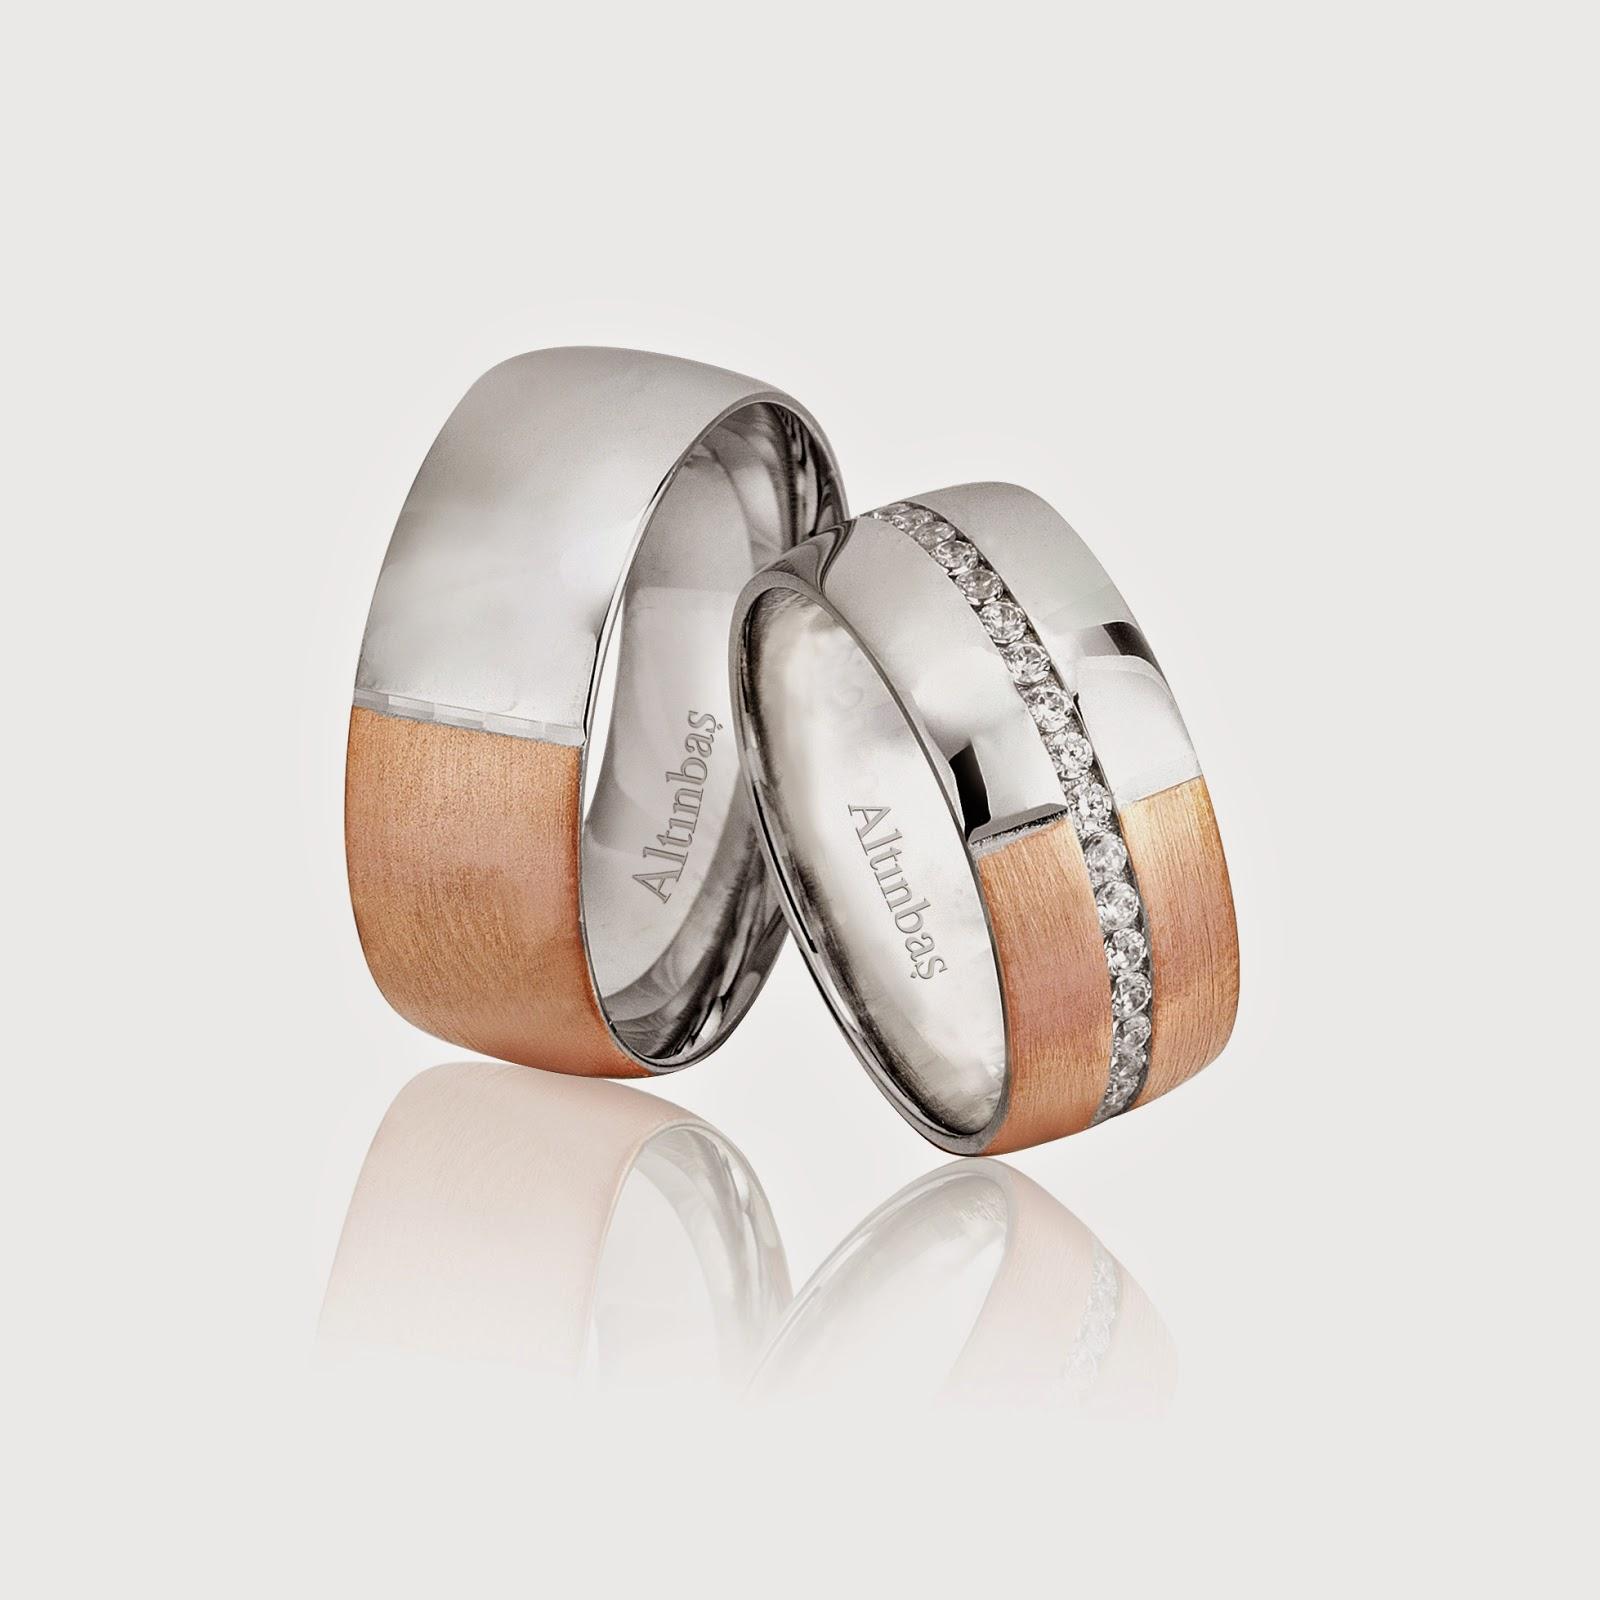 turkish weddings uk directory turkish wedding ring Contemporary classic wedding bands by Alt nba